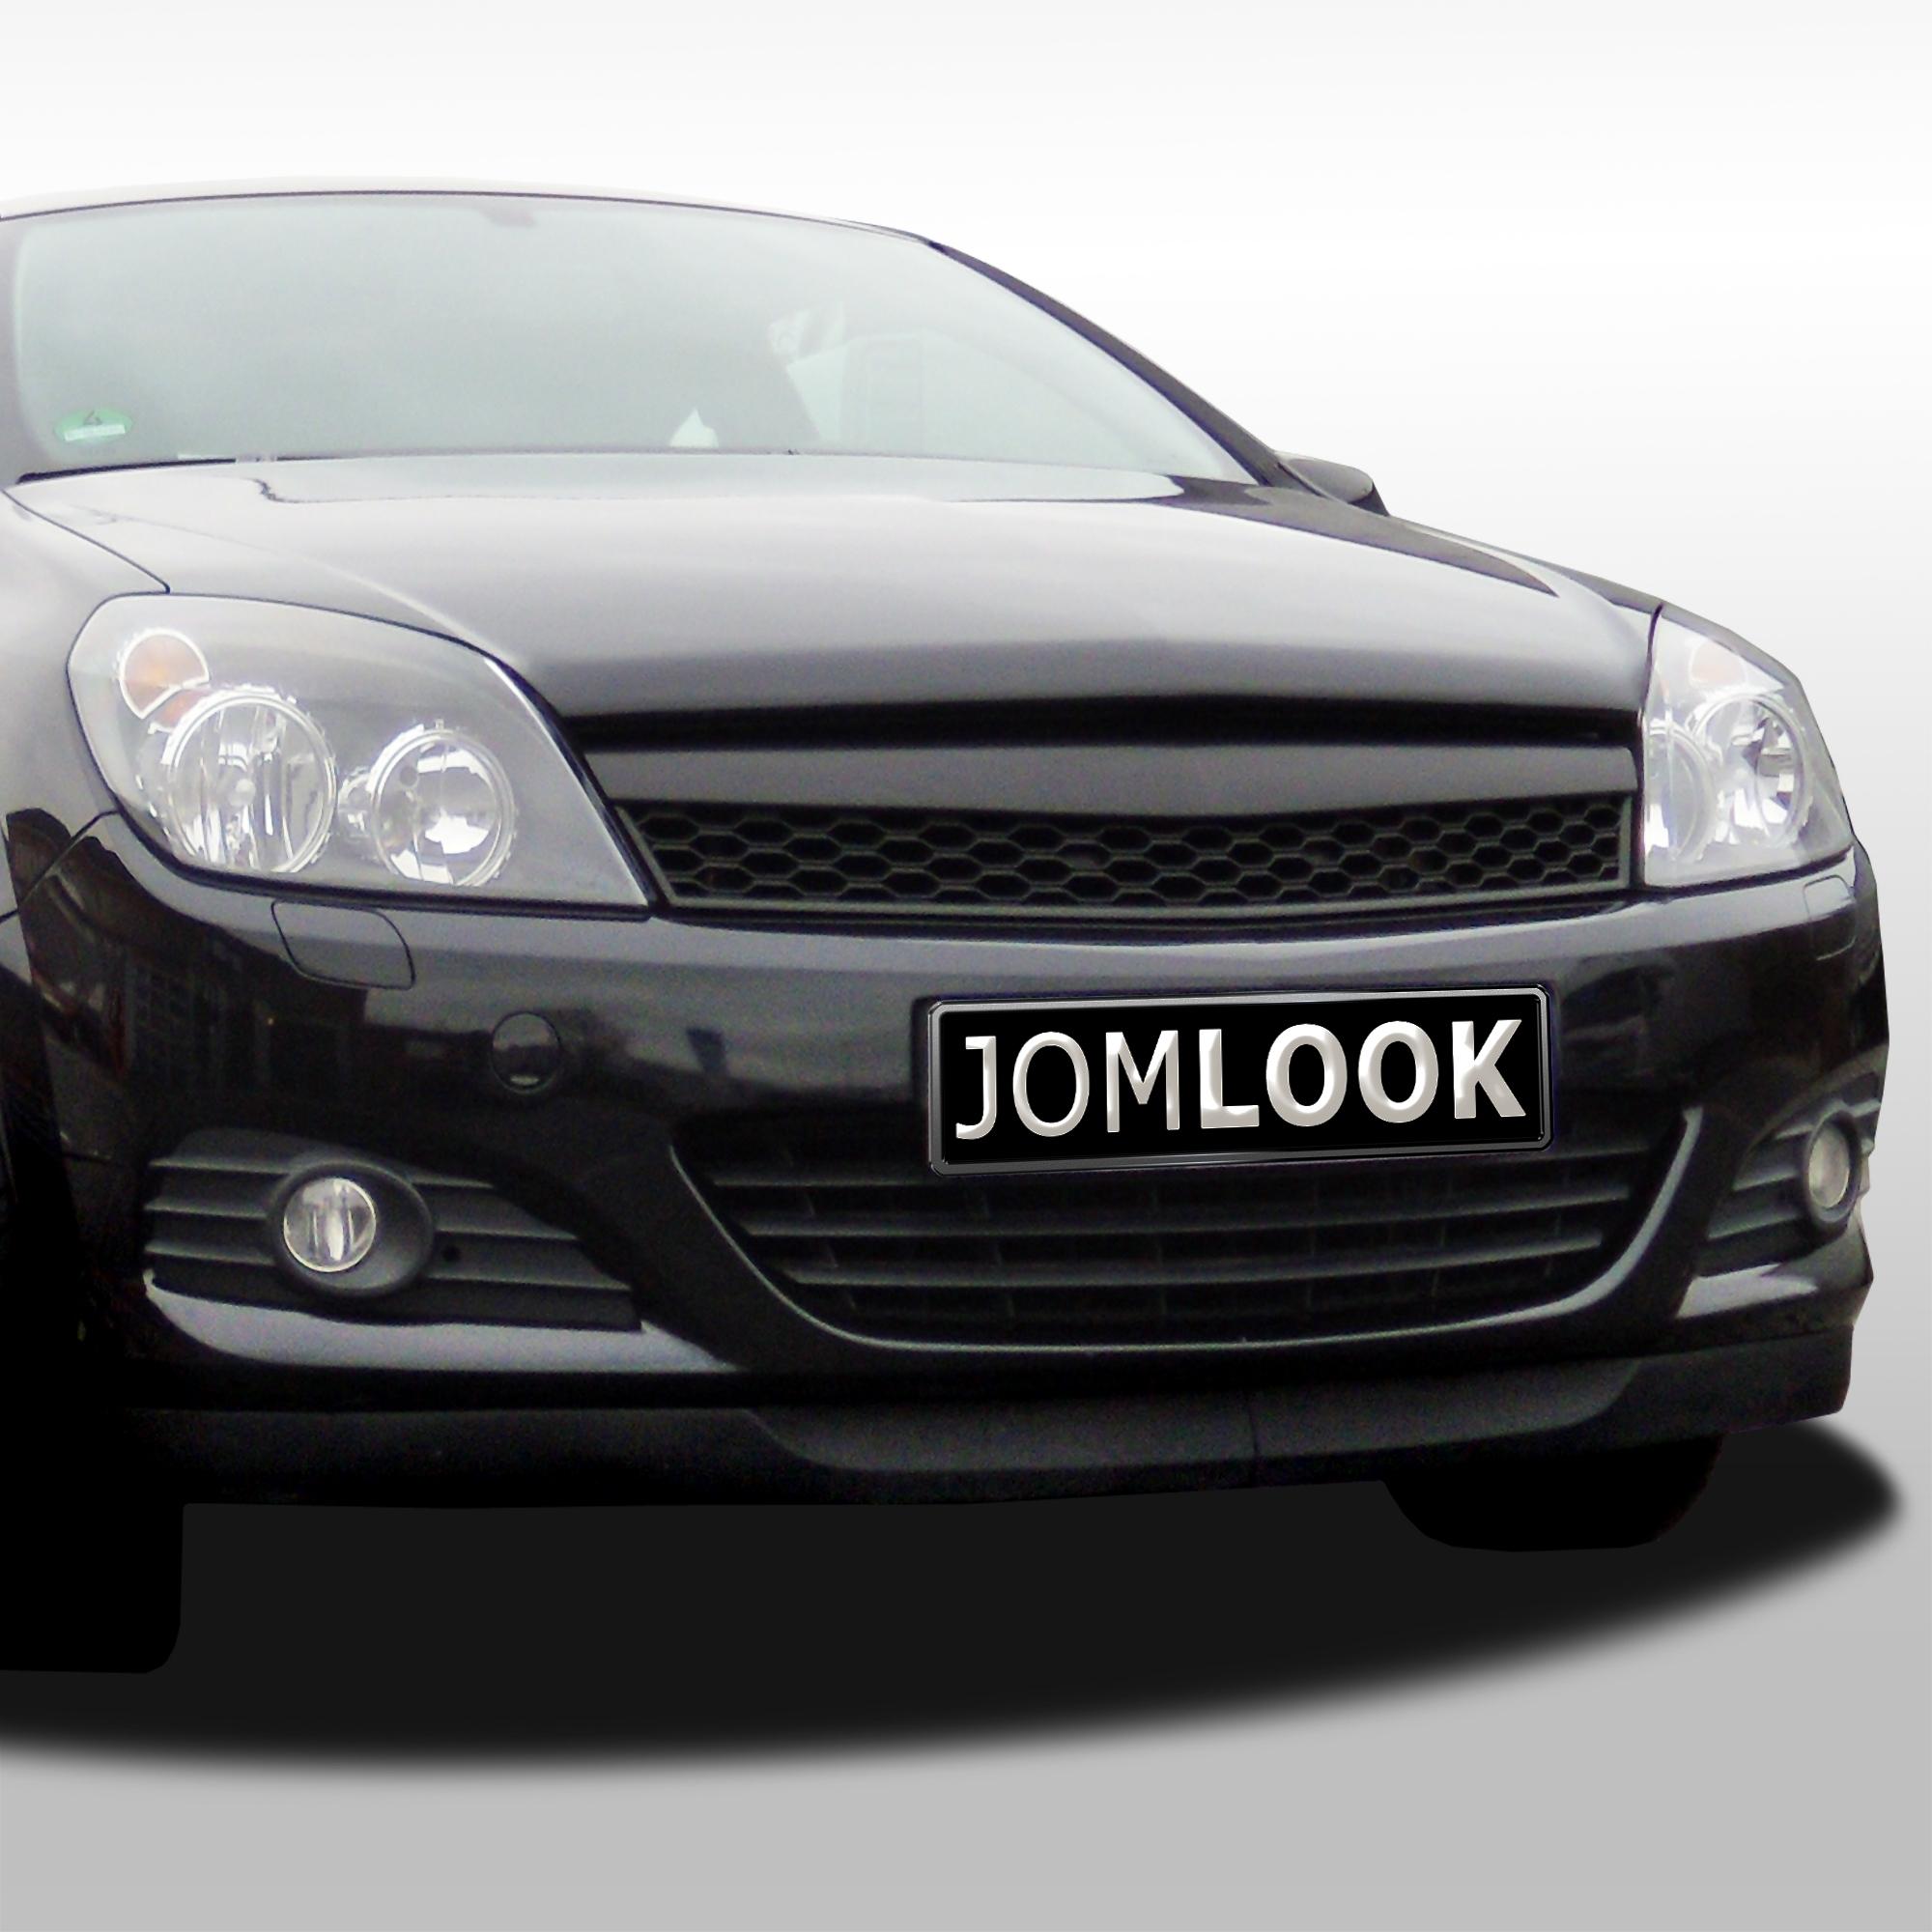 JOM Frontgrill sports look sort til Opel Astra H 3 dørsÅrgang 2005-2007 - uden logo Styling